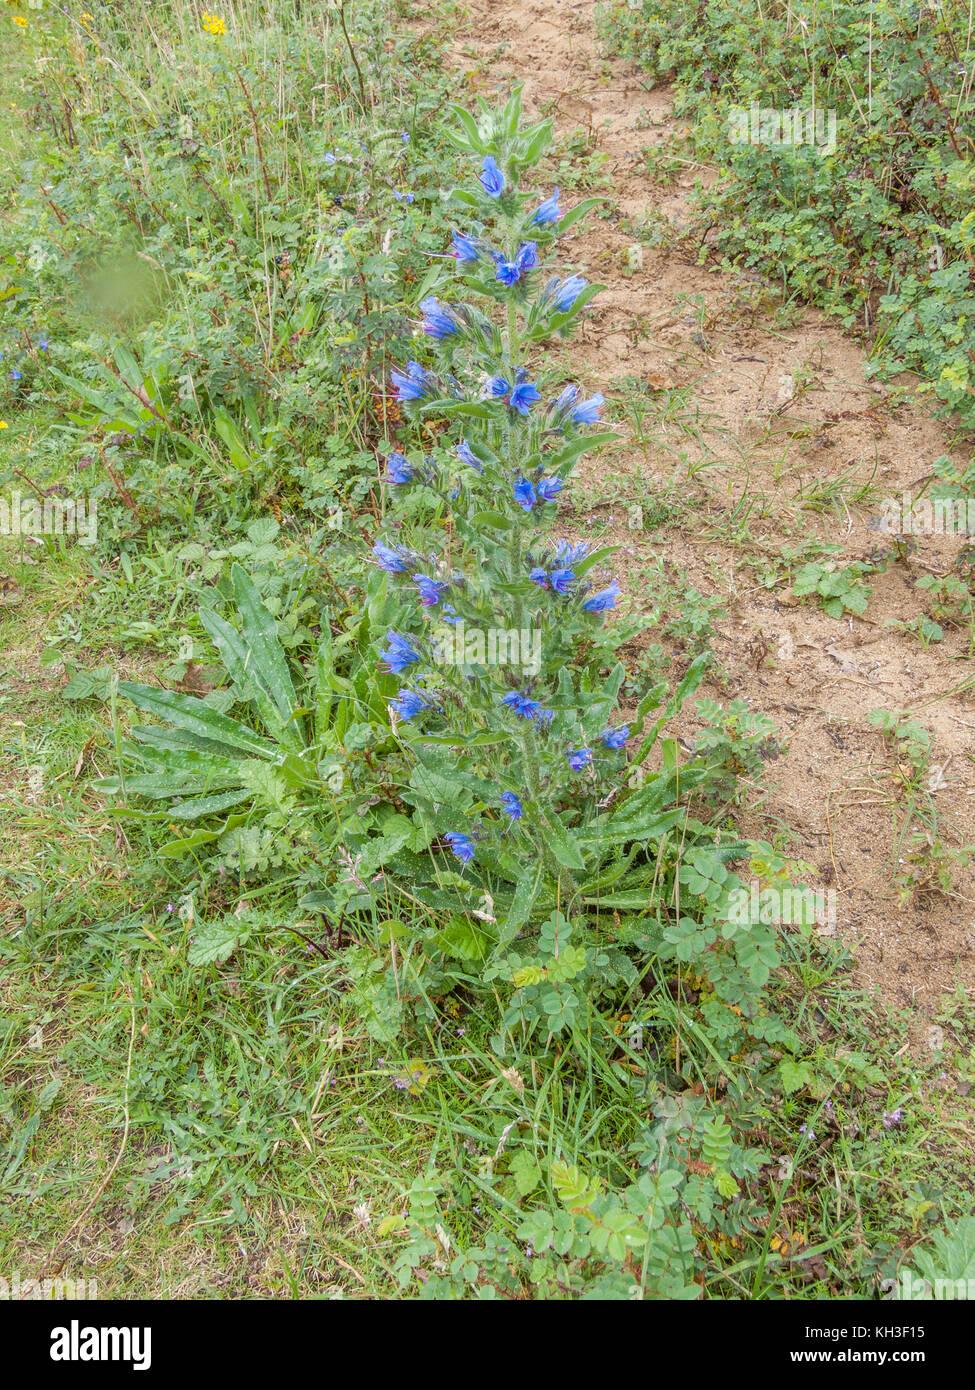 Flowering specimen of Viper's-bugloss (Echium vulgare) growing in sandy soil. - Stock Image